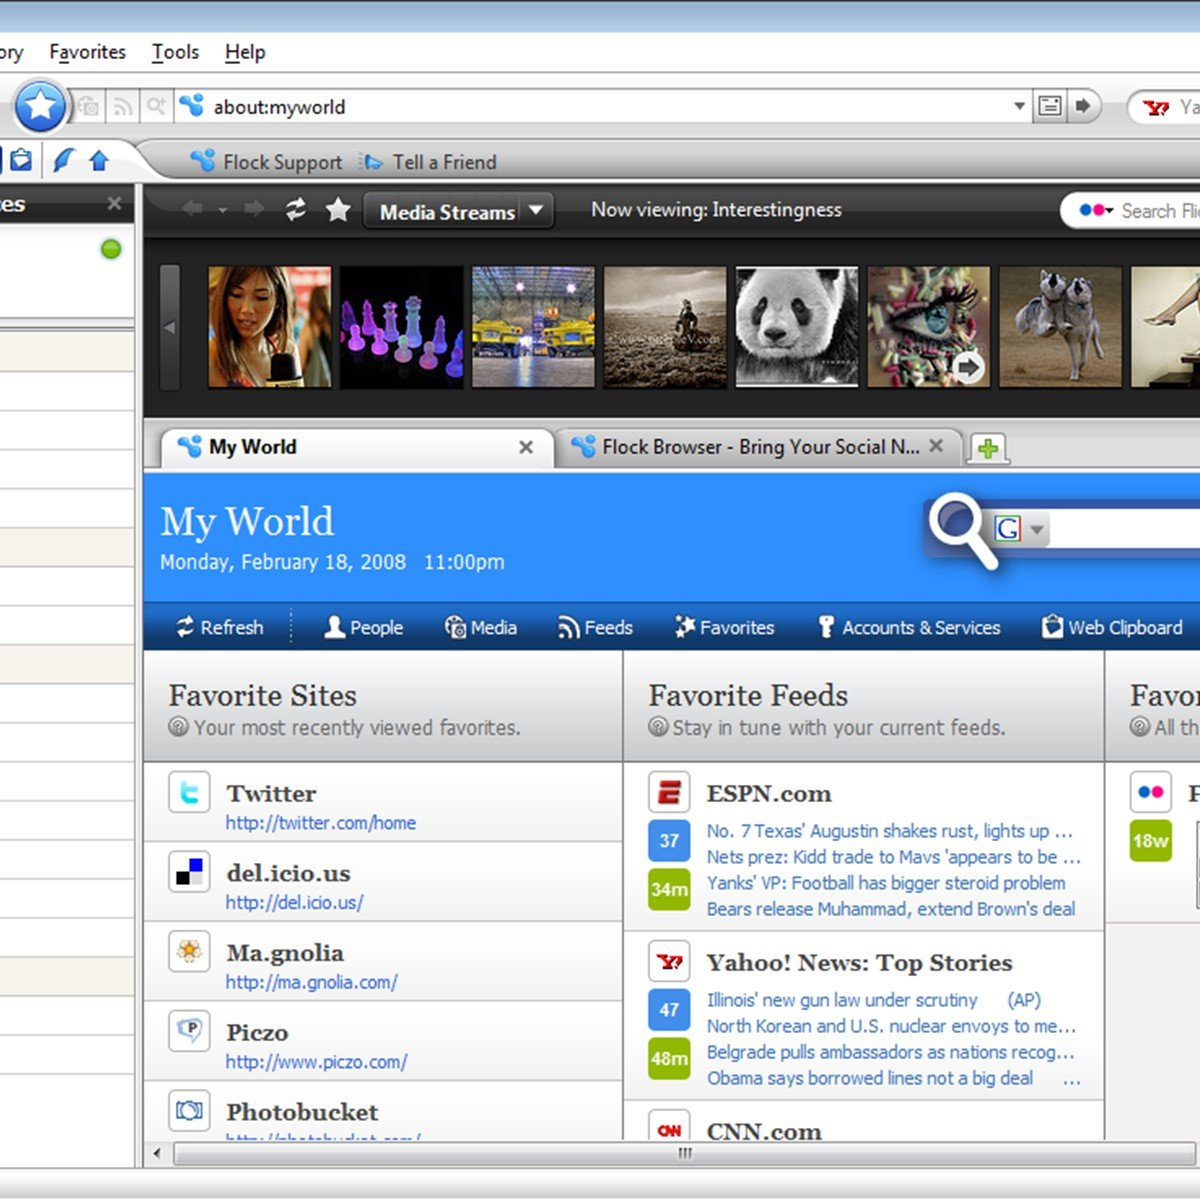 Flock Browser Alternatives and Similar Software